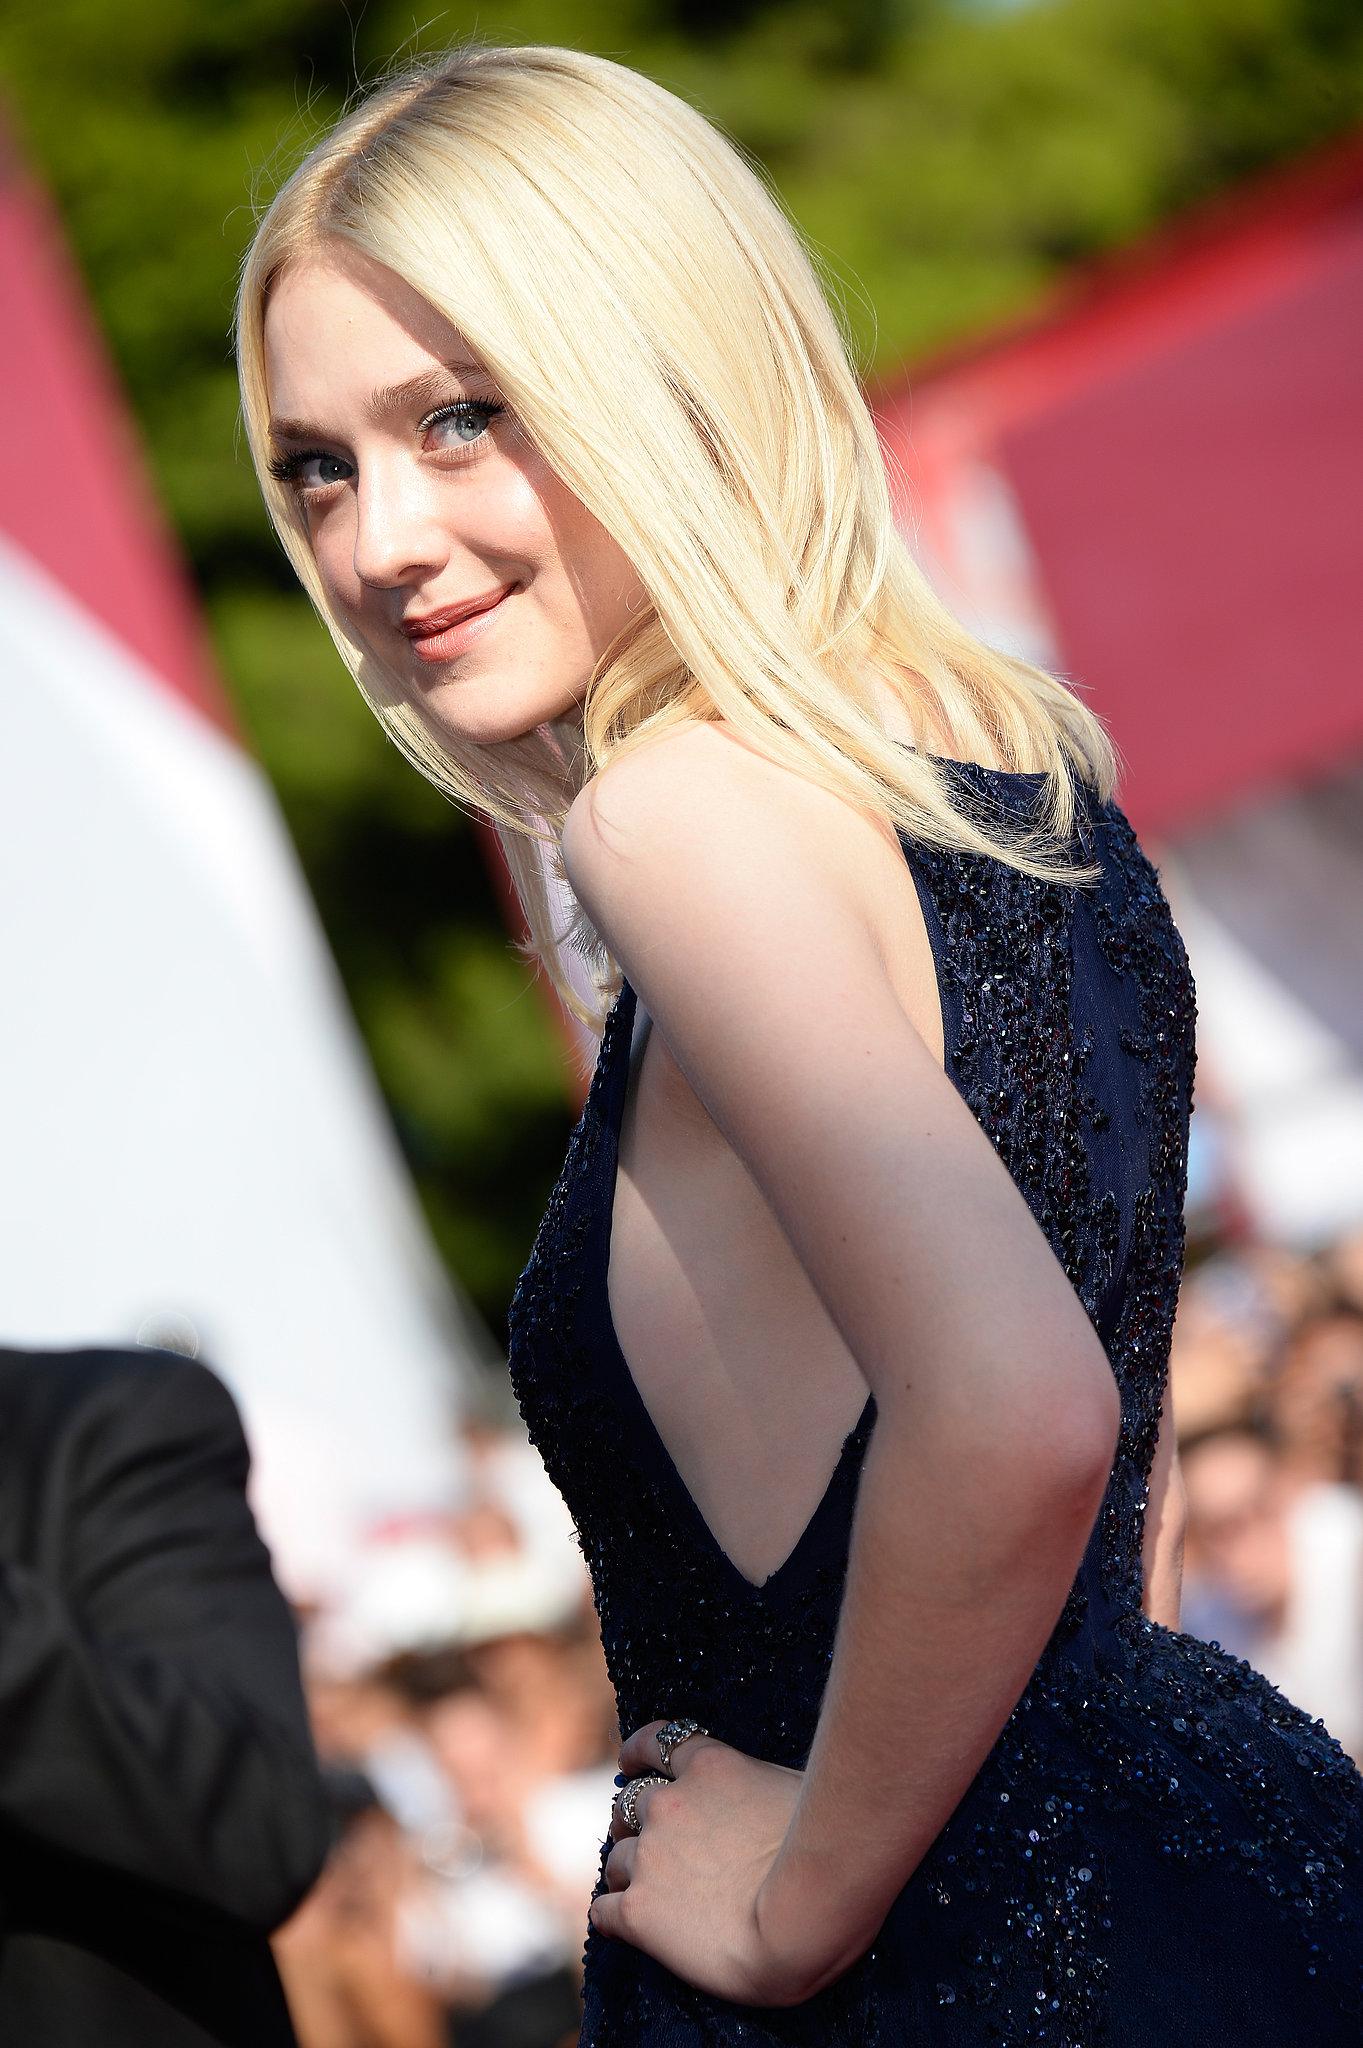 Dakota Fanning struck an over-the-shoulder pose at the Venice Film Festival.